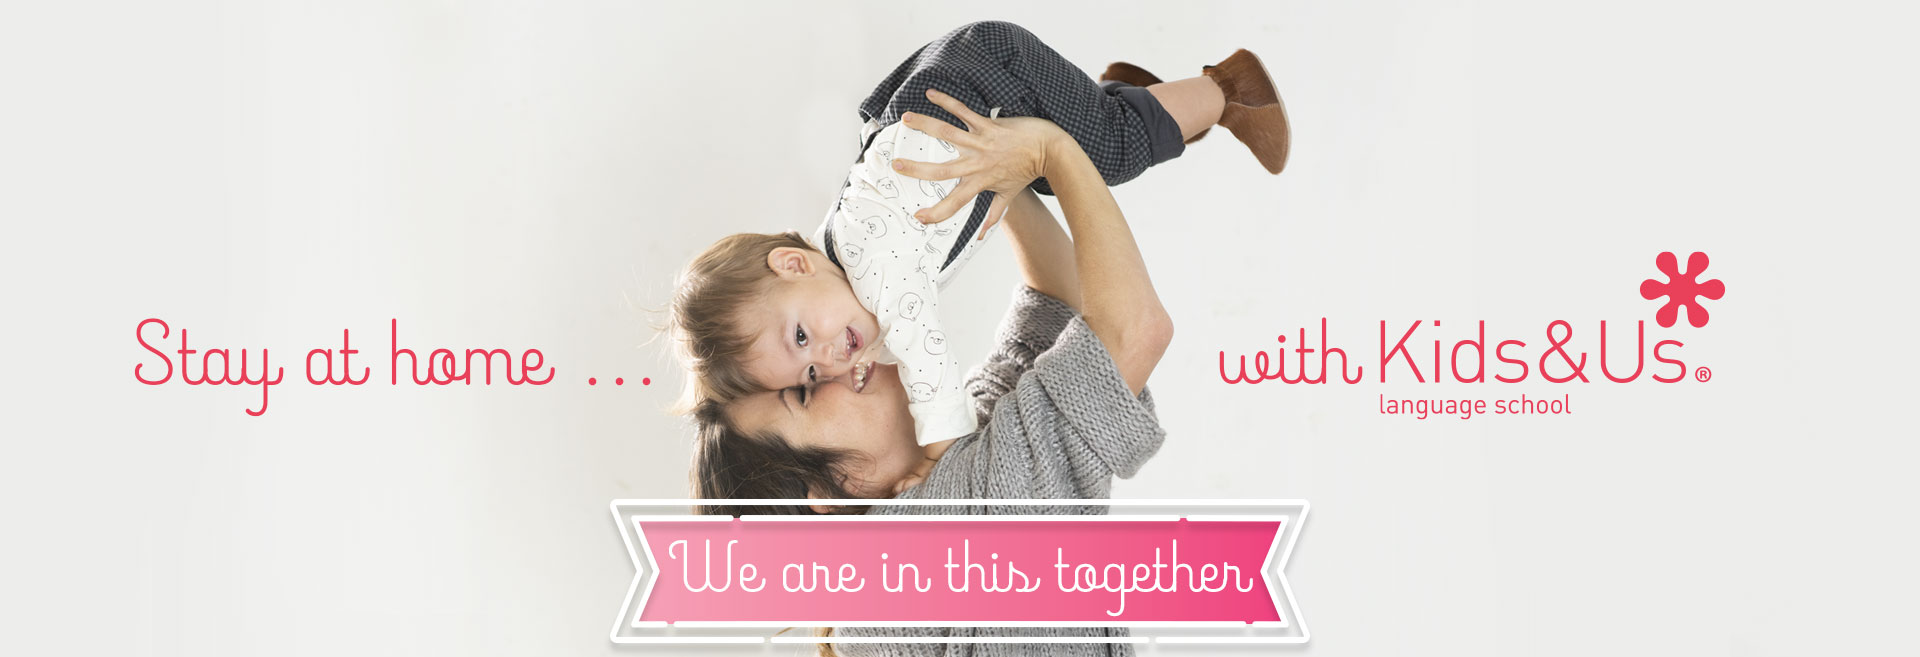 Lee los post del blog de Kids&Us